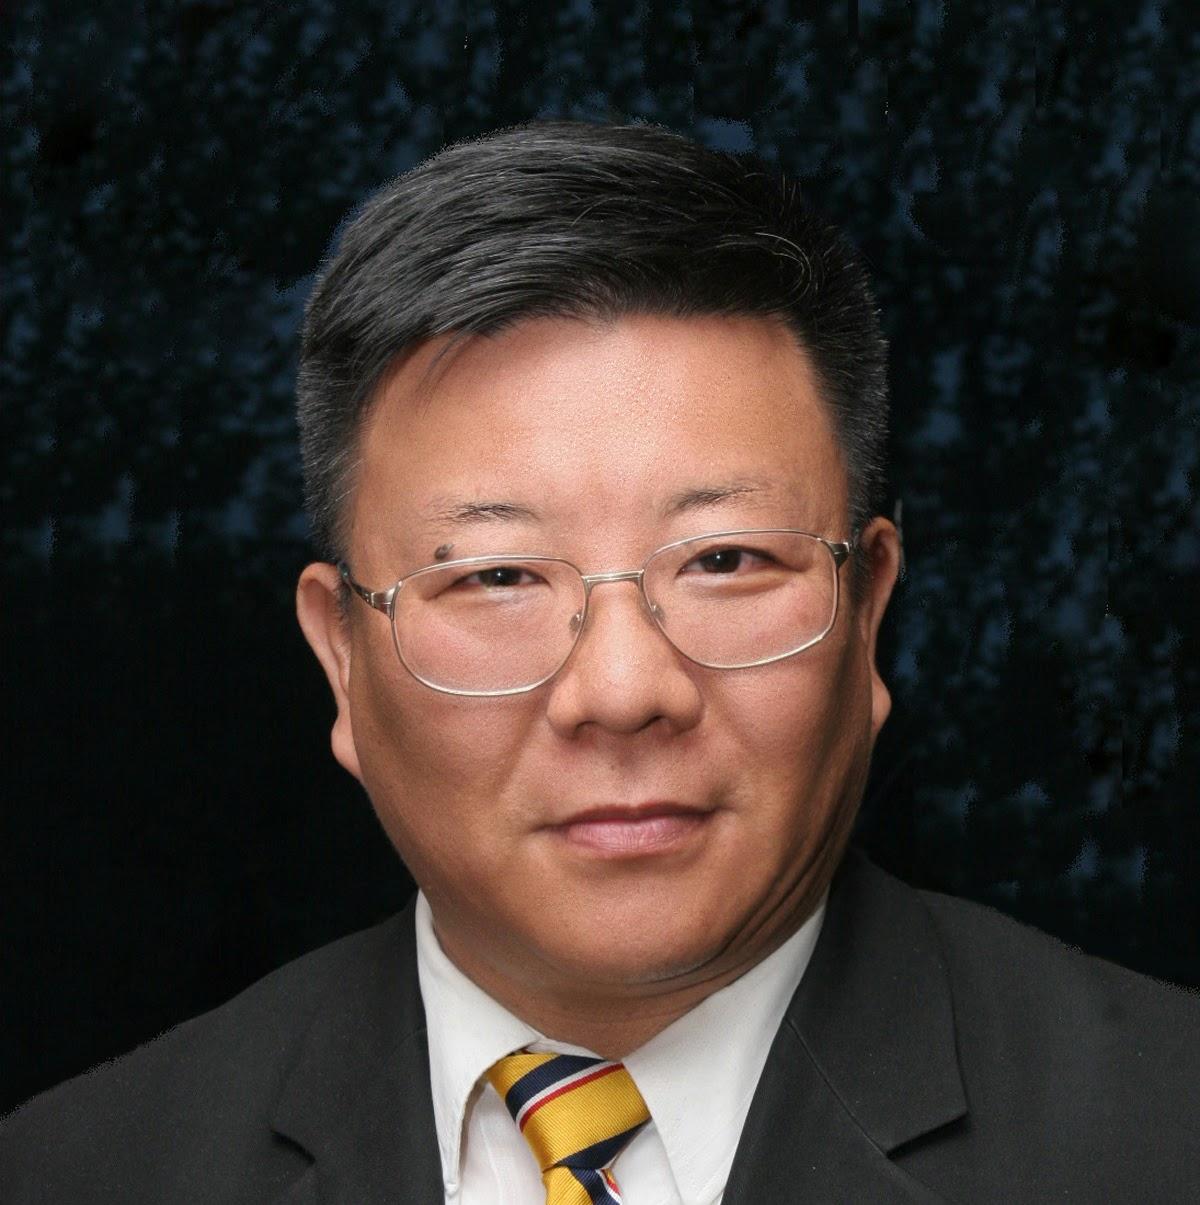 Kim, Samuel (II) Biography